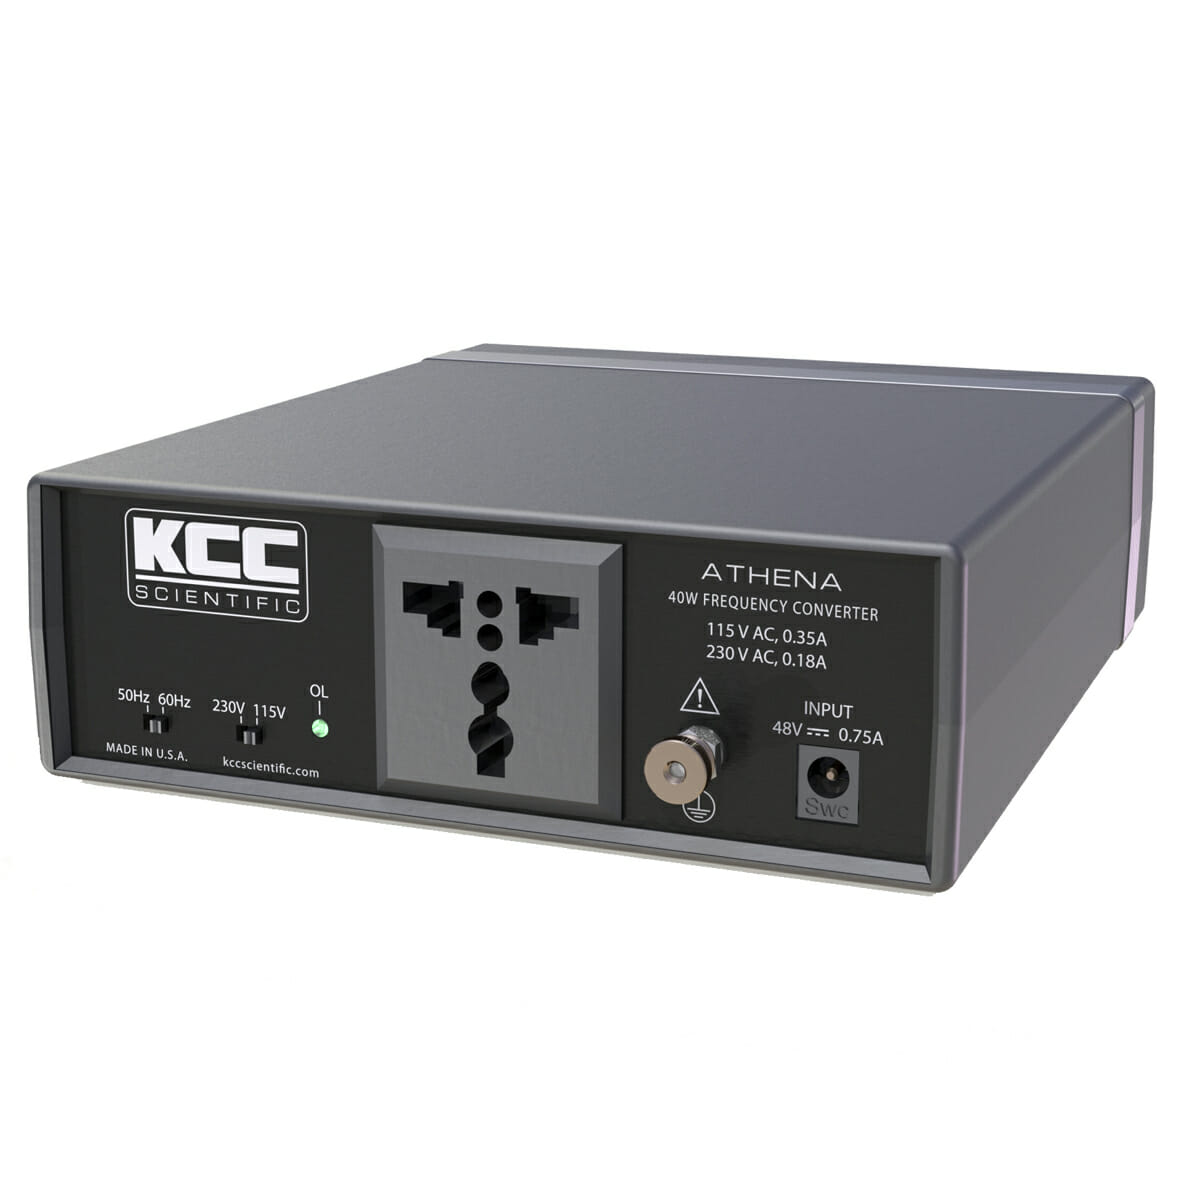 athena frequency converter kcc scientific. Black Bedroom Furniture Sets. Home Design Ideas